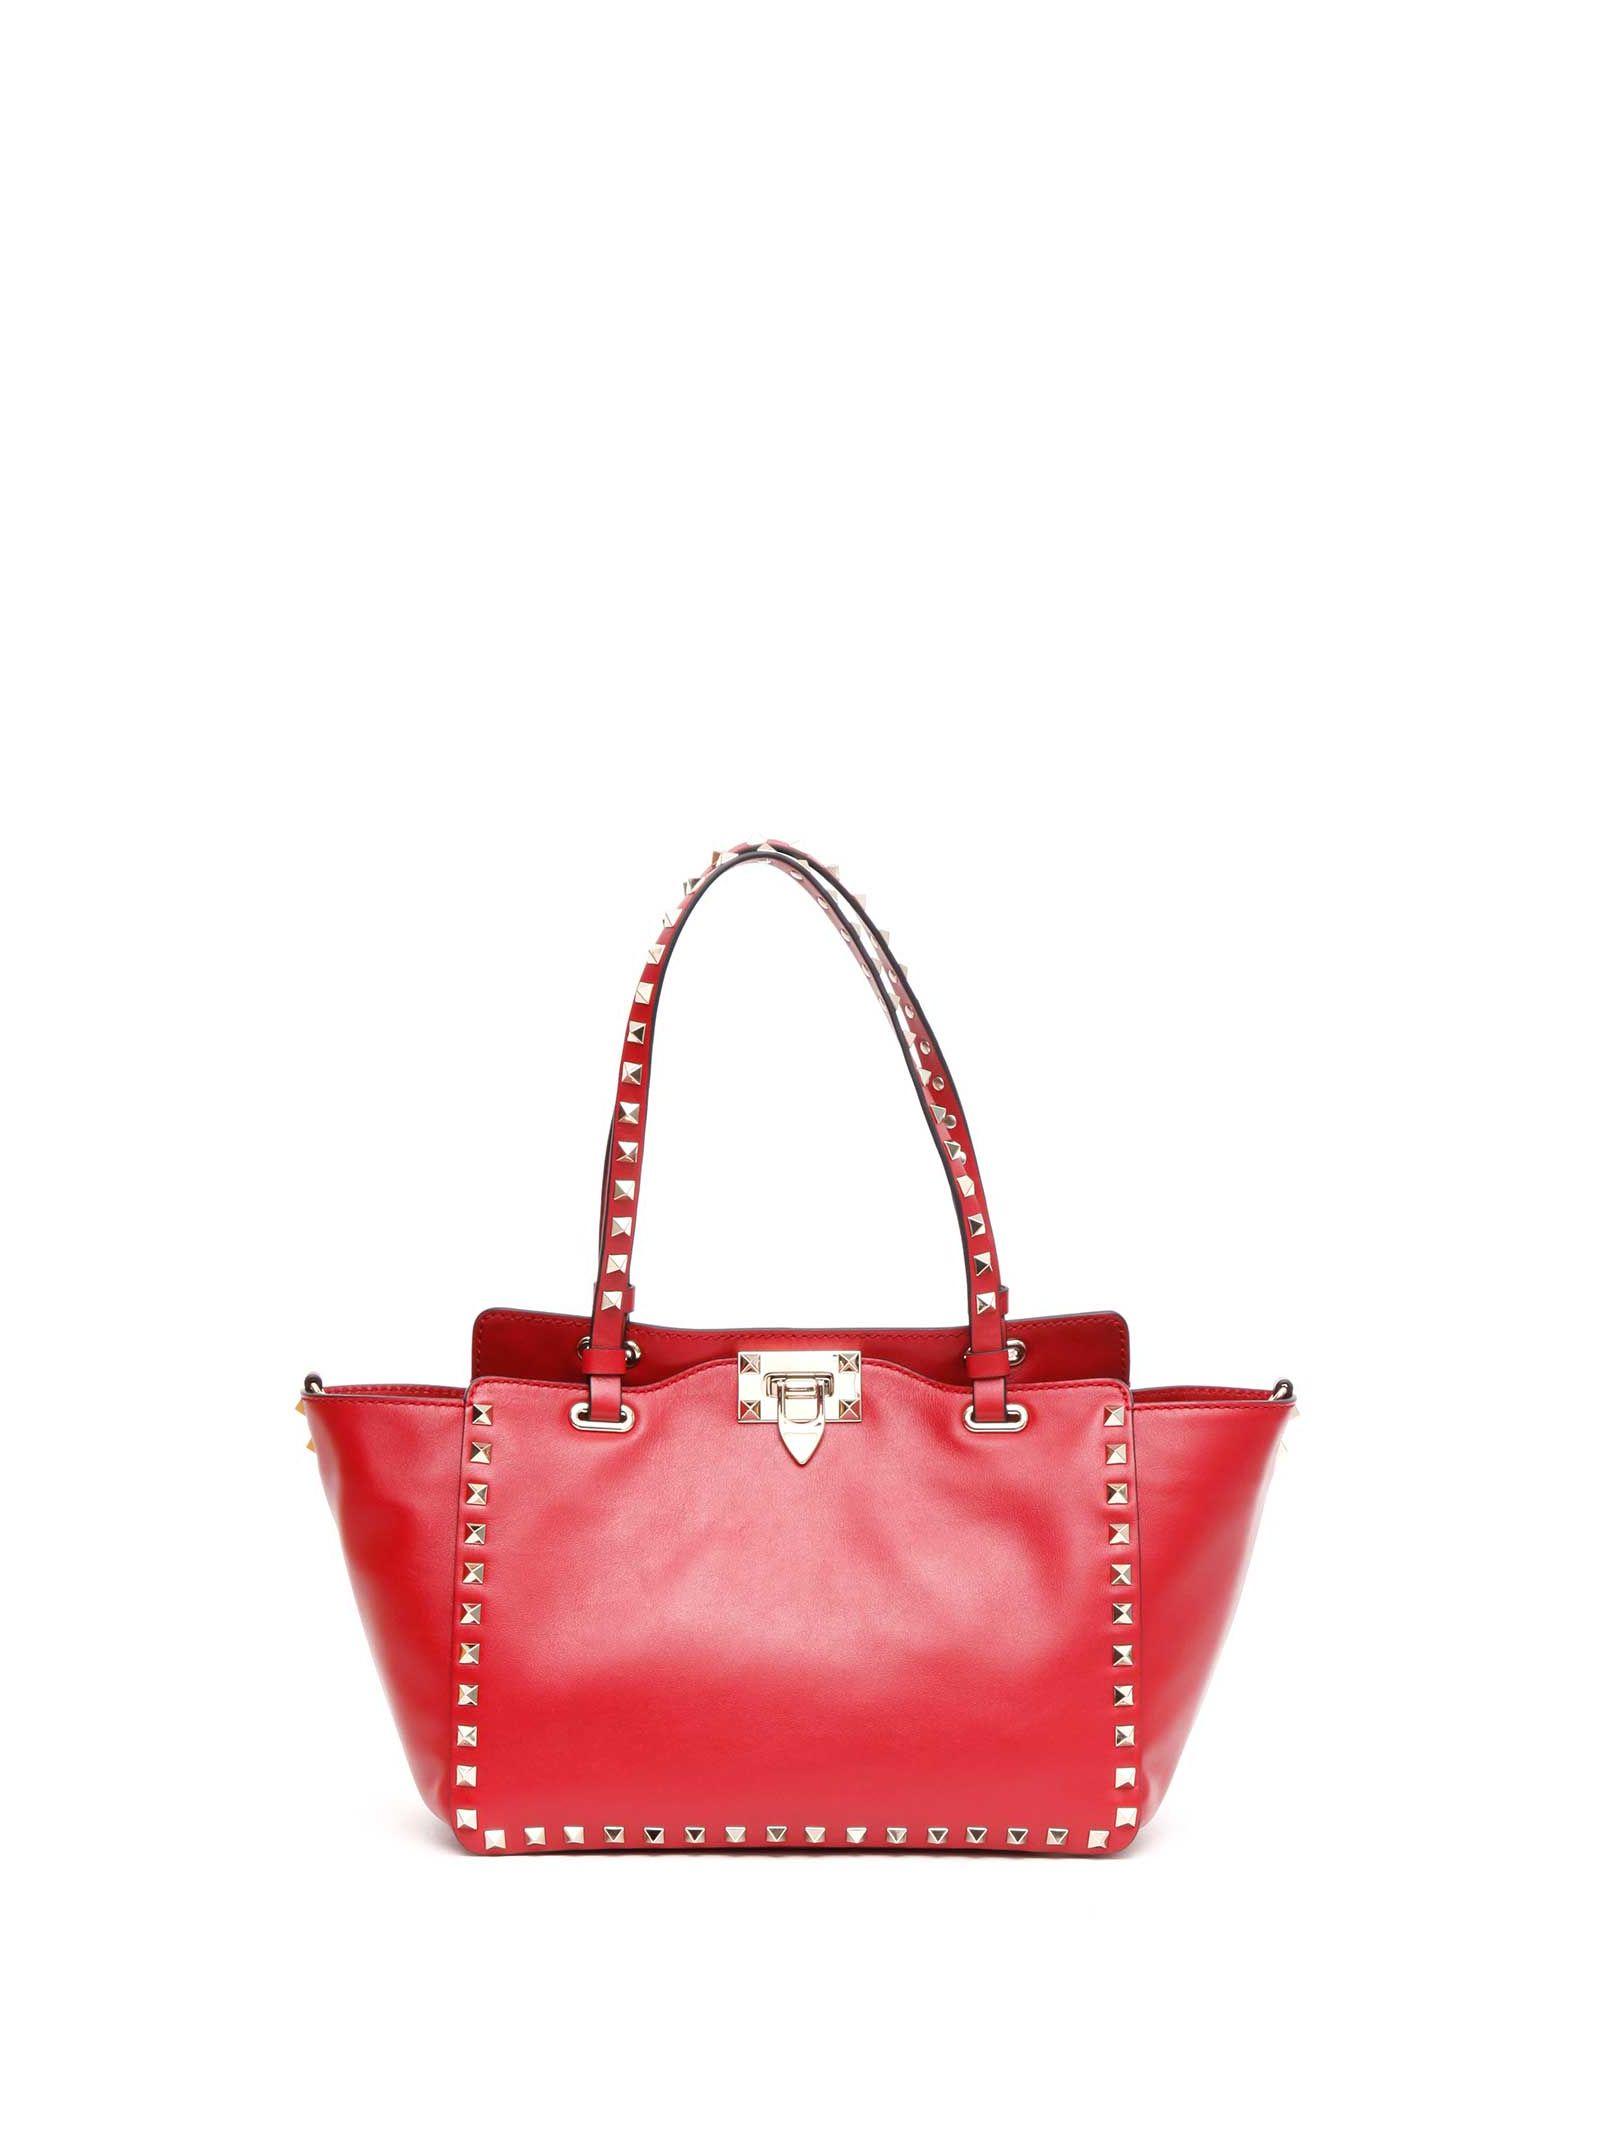 Valentino Garavani rockstud Shopping Bag